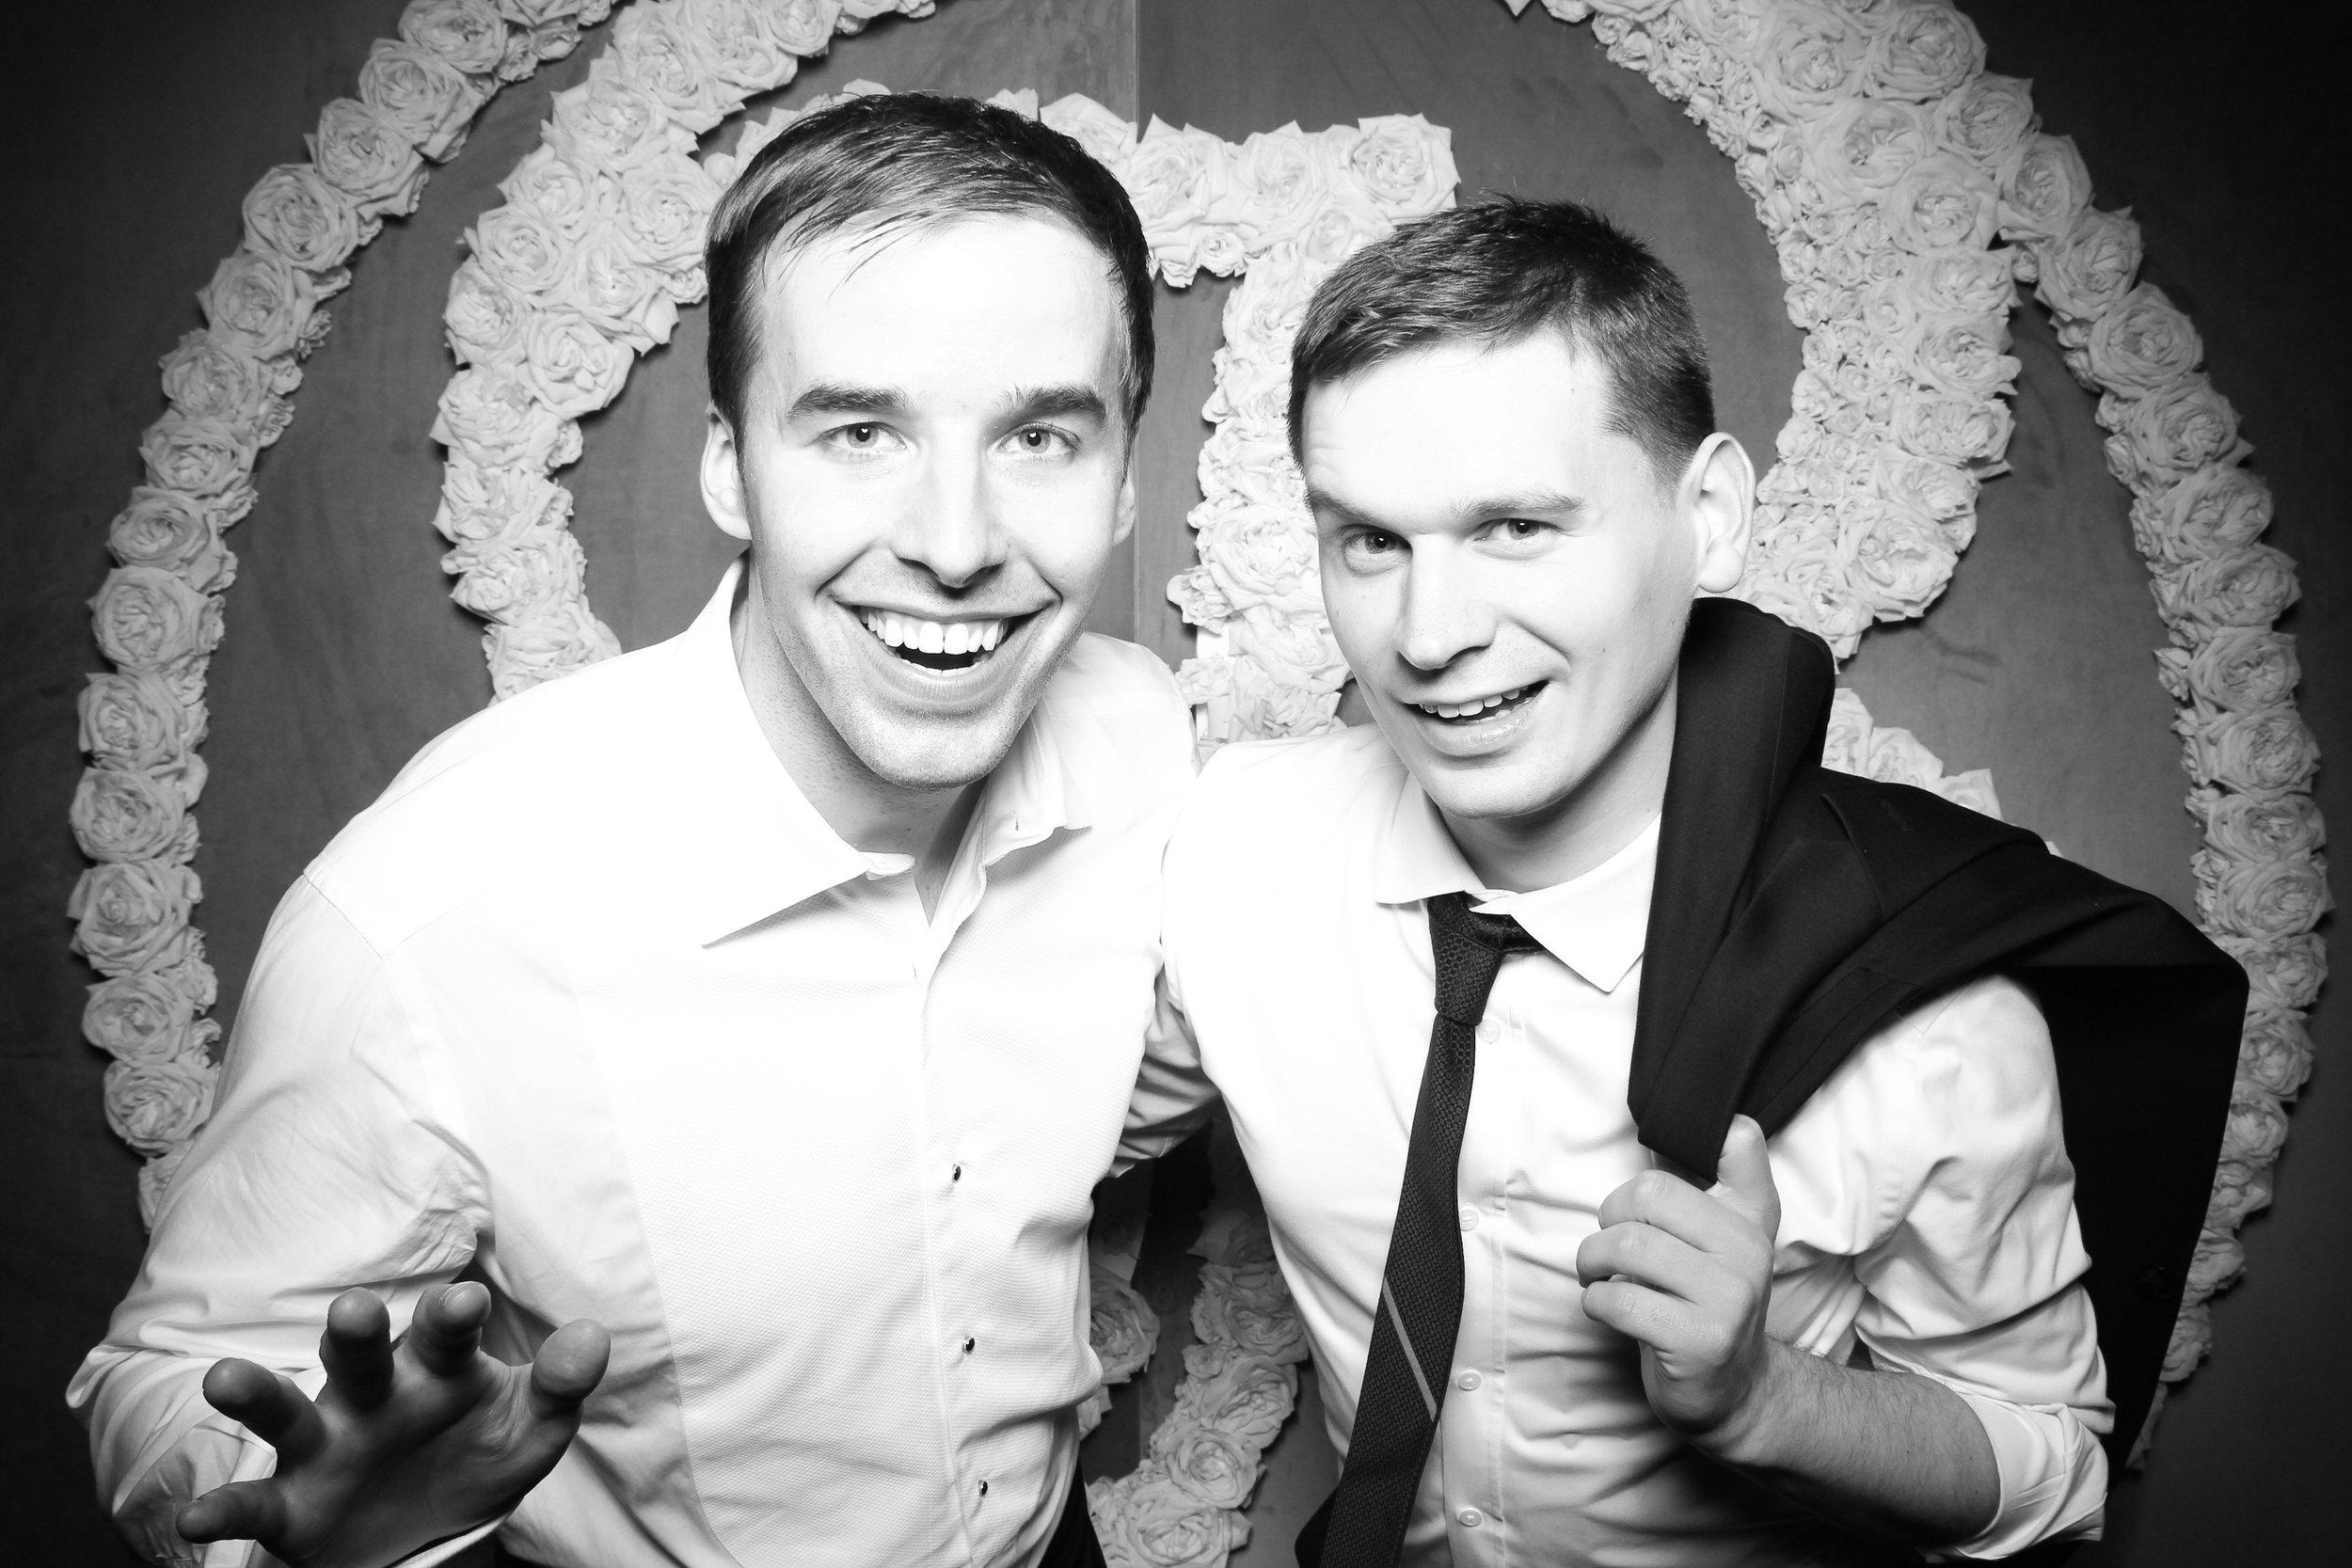 Photo_Booth_Rental_At_Standard_Club_Wedding_Chicago_12.jpg